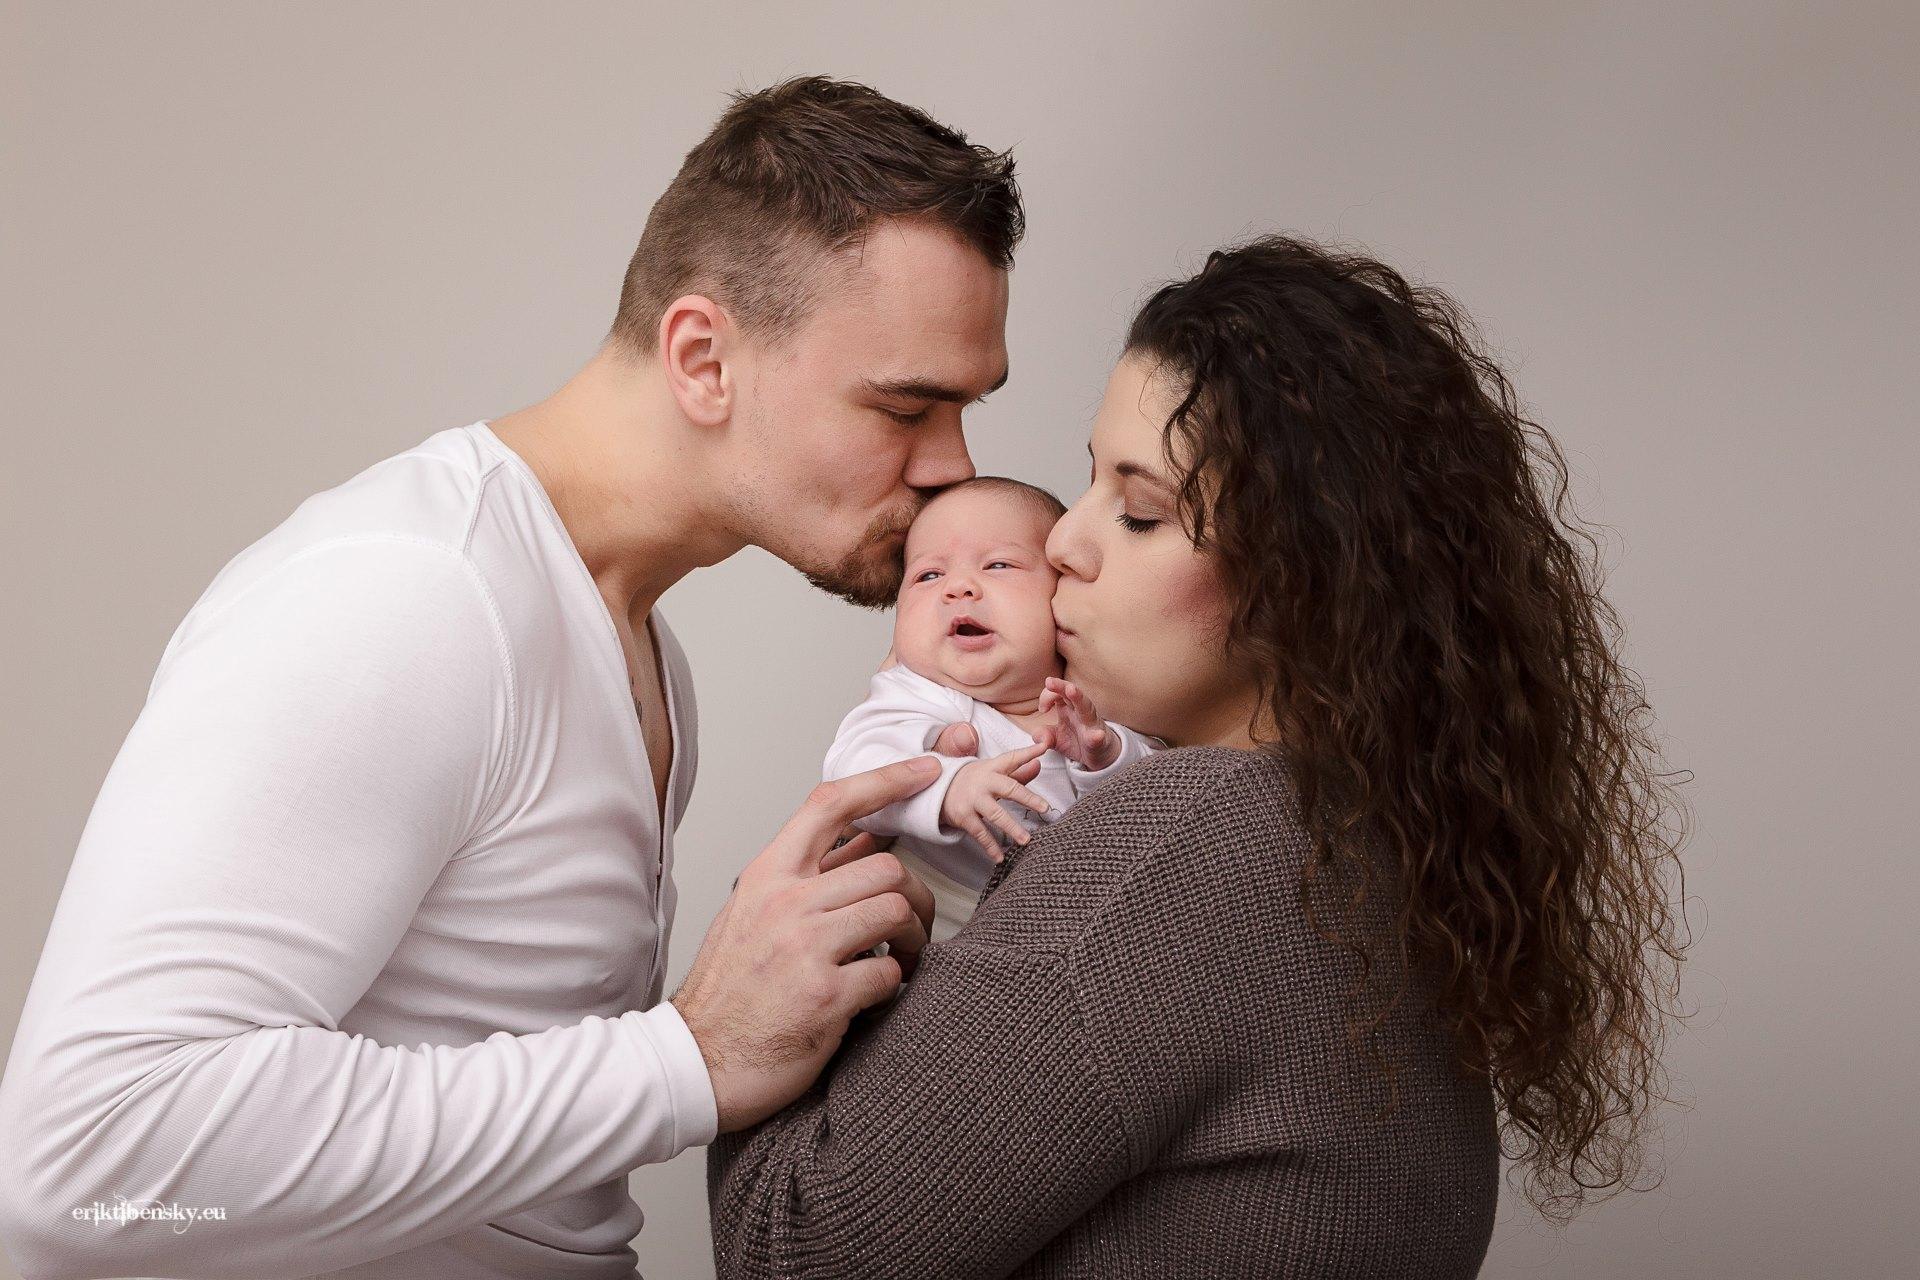 eriktibensky-eu-fotograf-deti-children-rodina-family-photo-pezinok-bratislava-1016